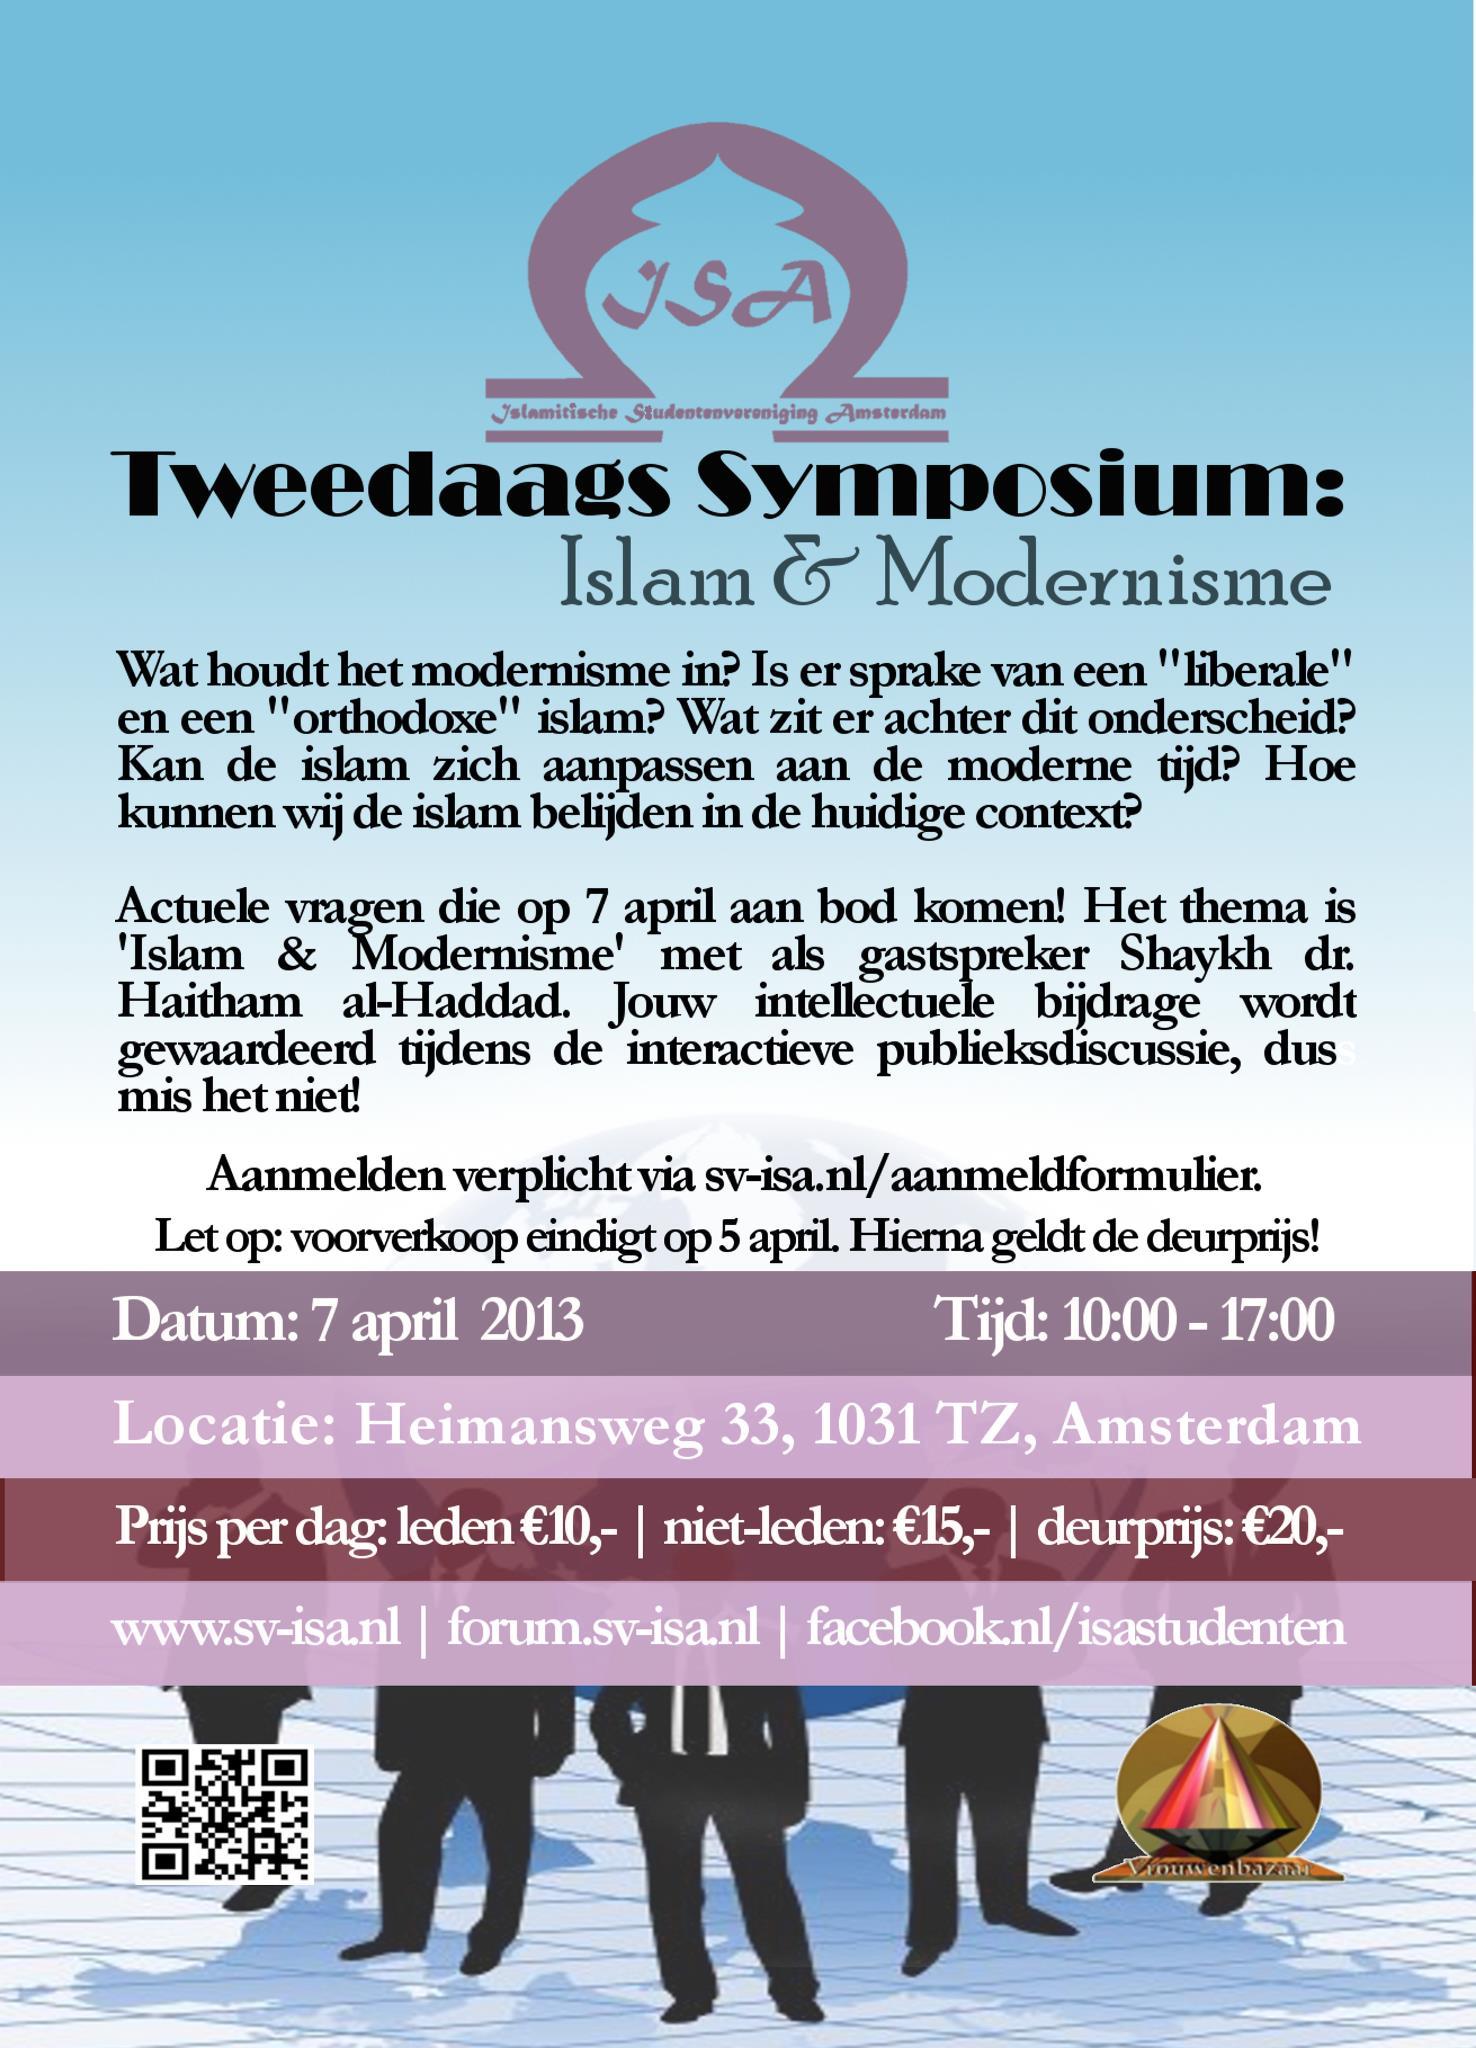 Islam & Modernisme